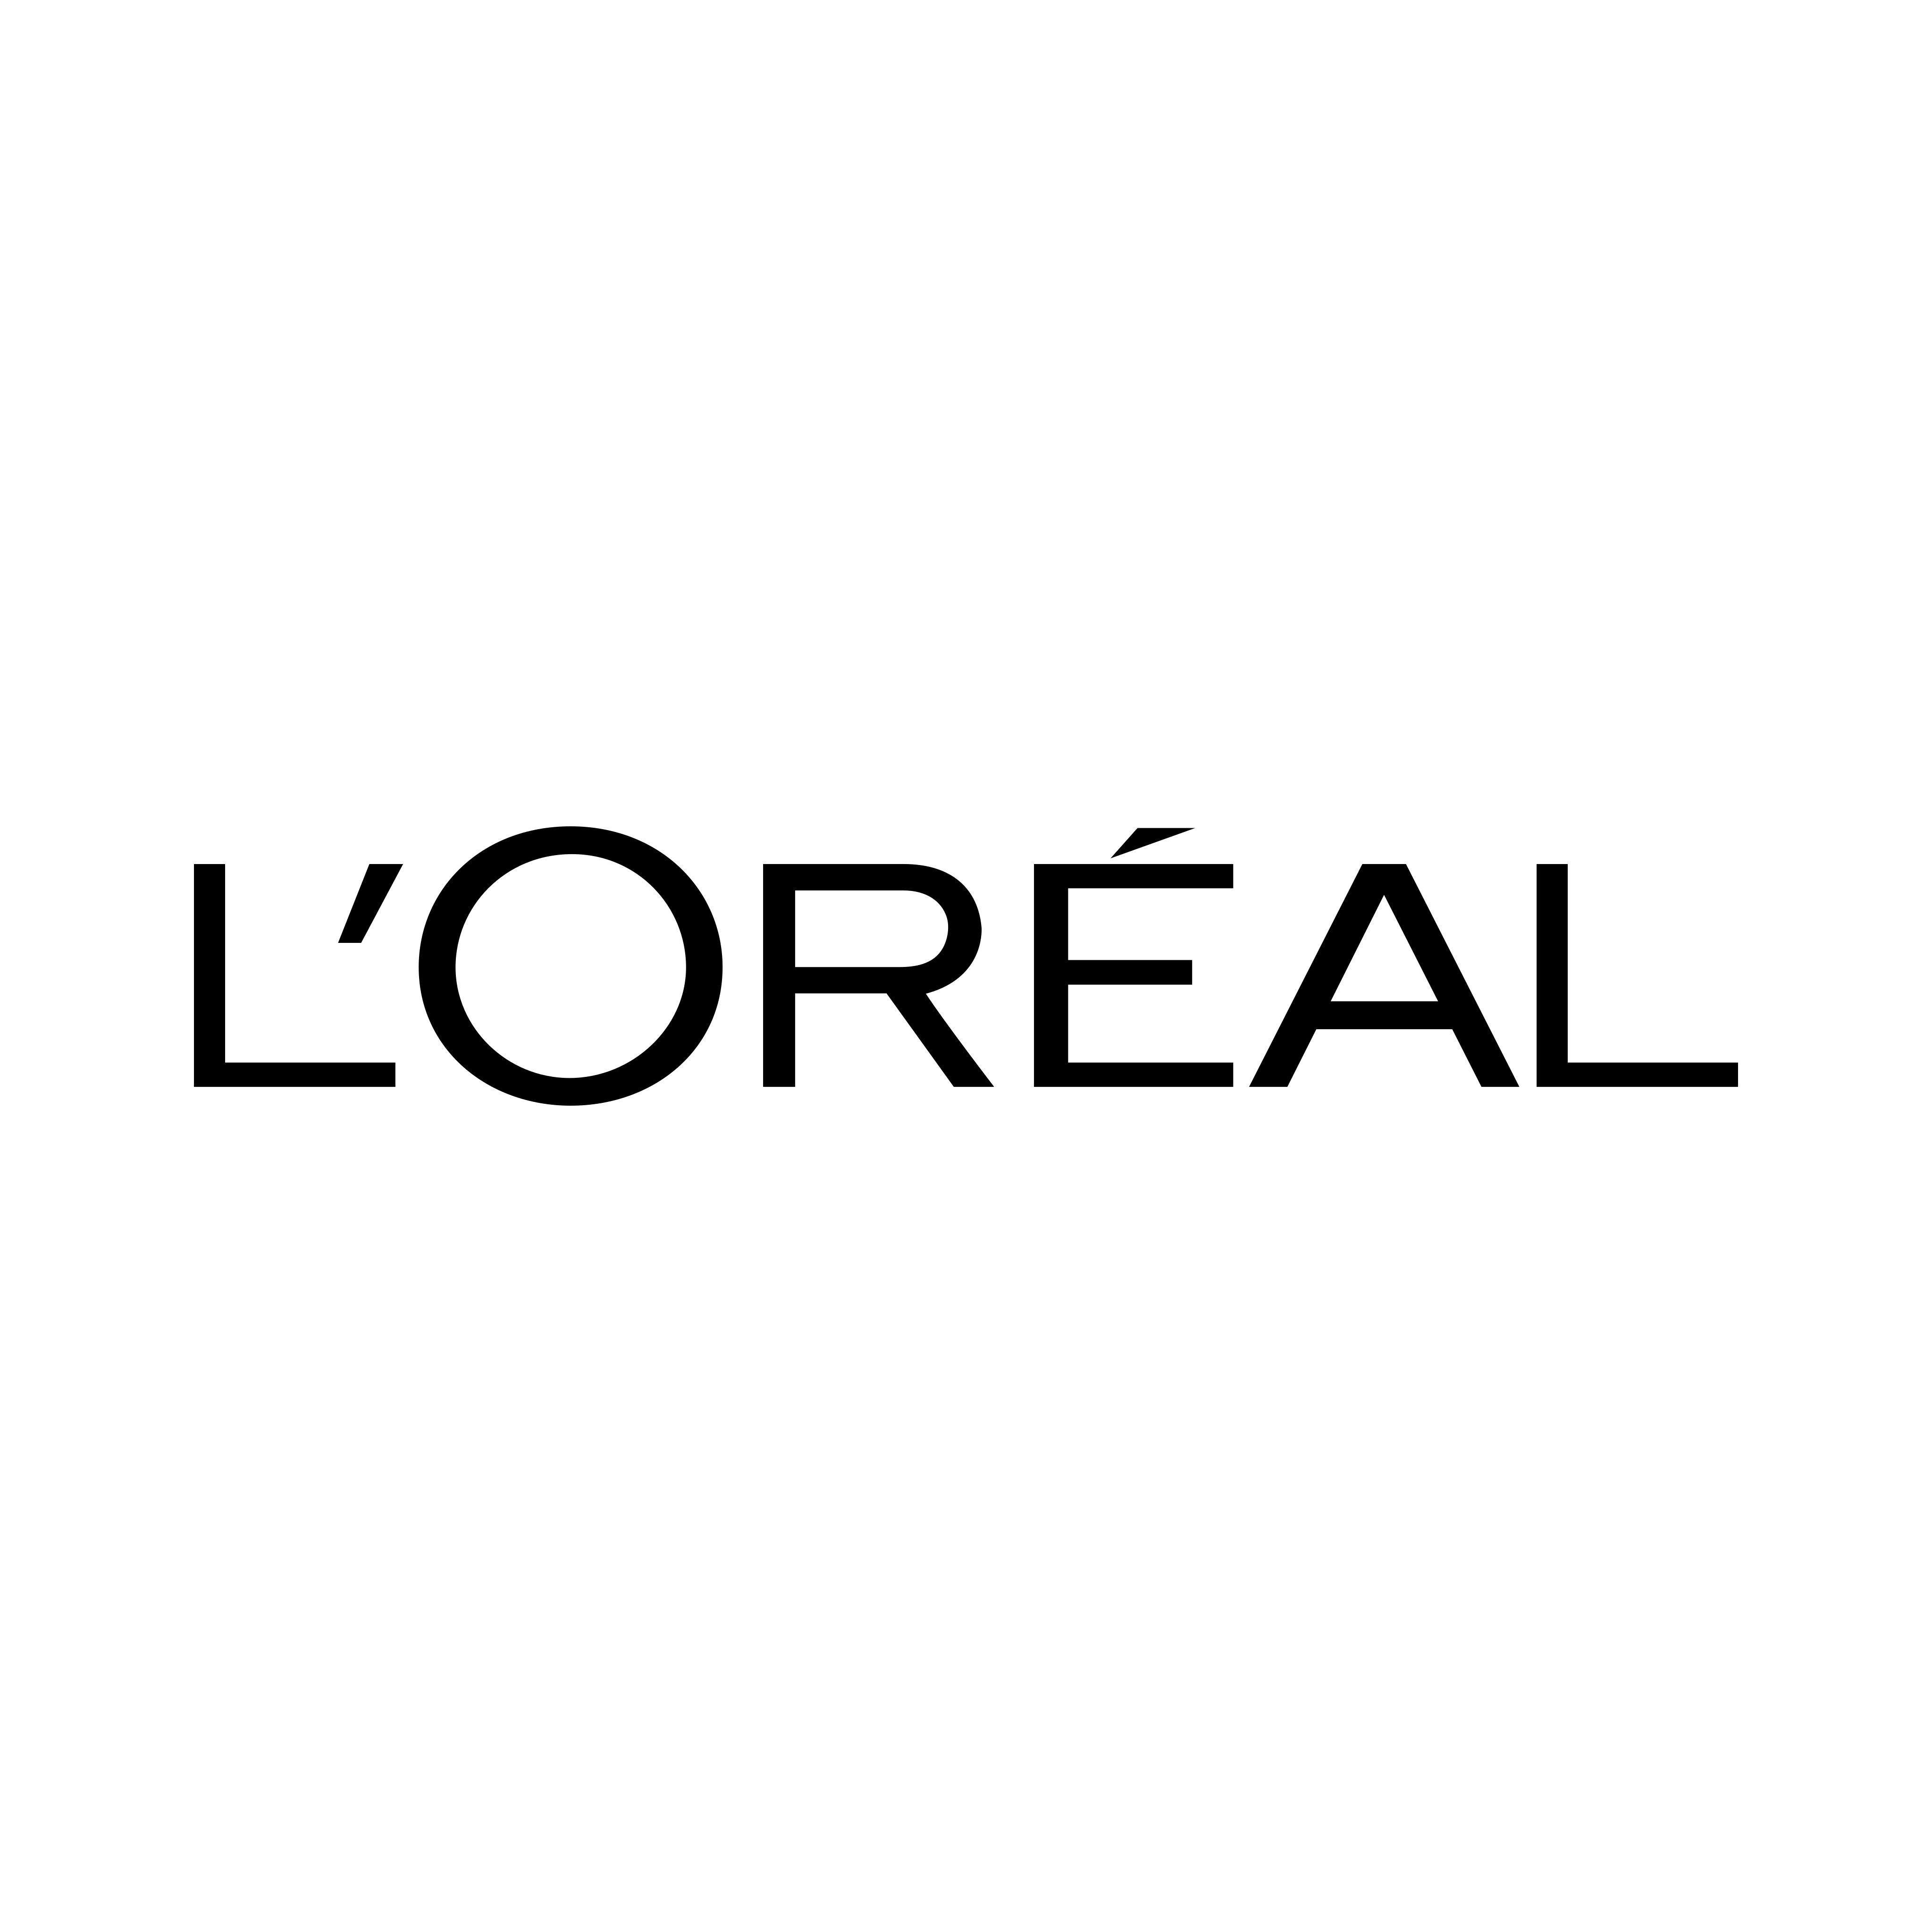 loreal logo 0 - L'Oréal Logo